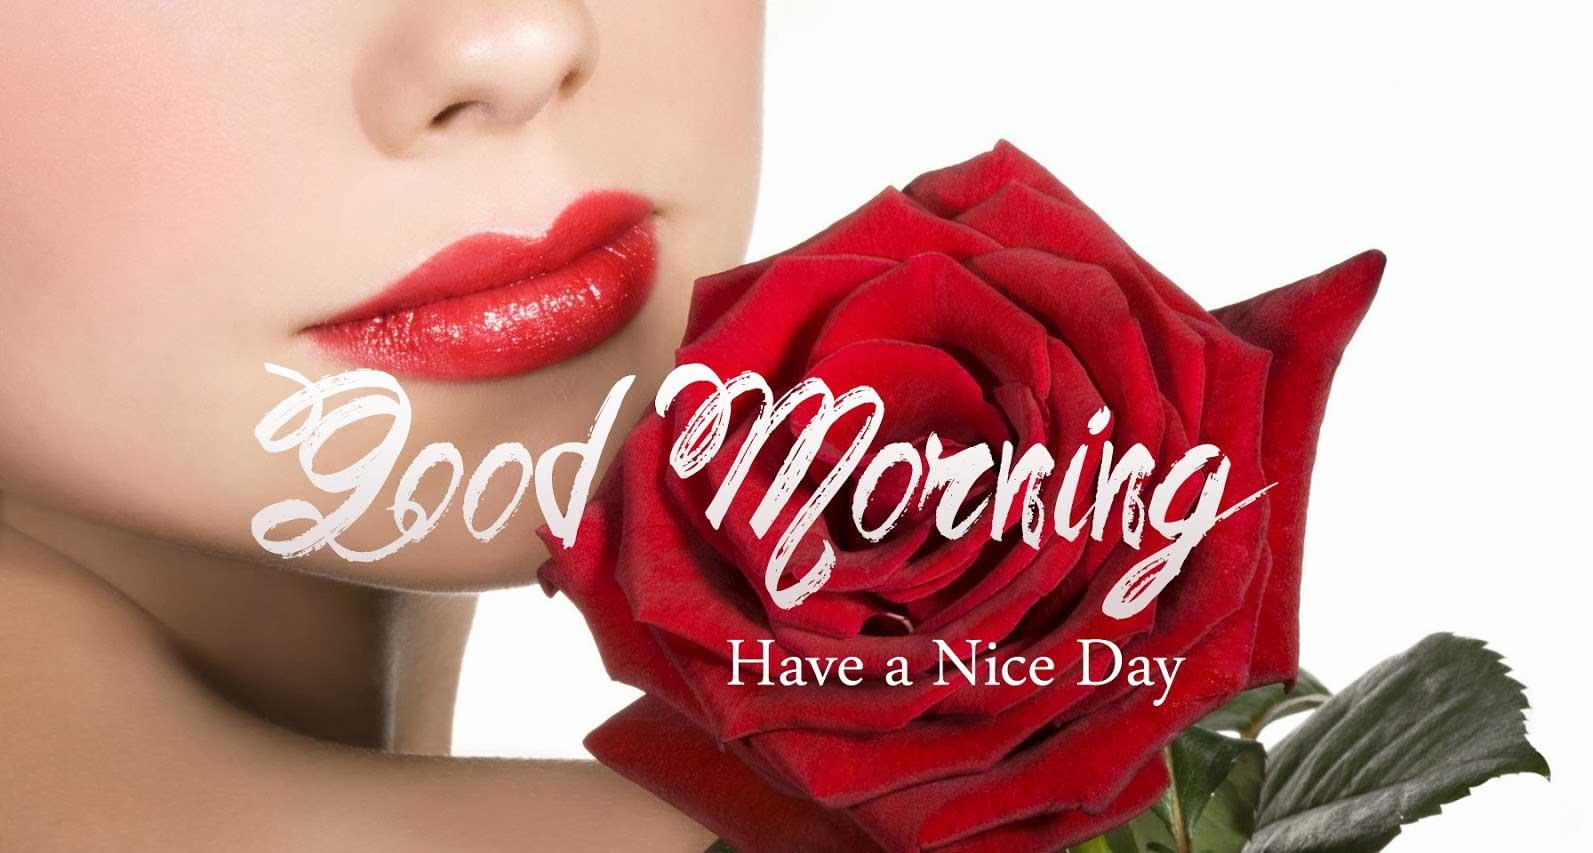 Good Morning Wallpaper - Beautiful Lovely Beautiful Good Mornings , HD Wallpaper & Backgrounds